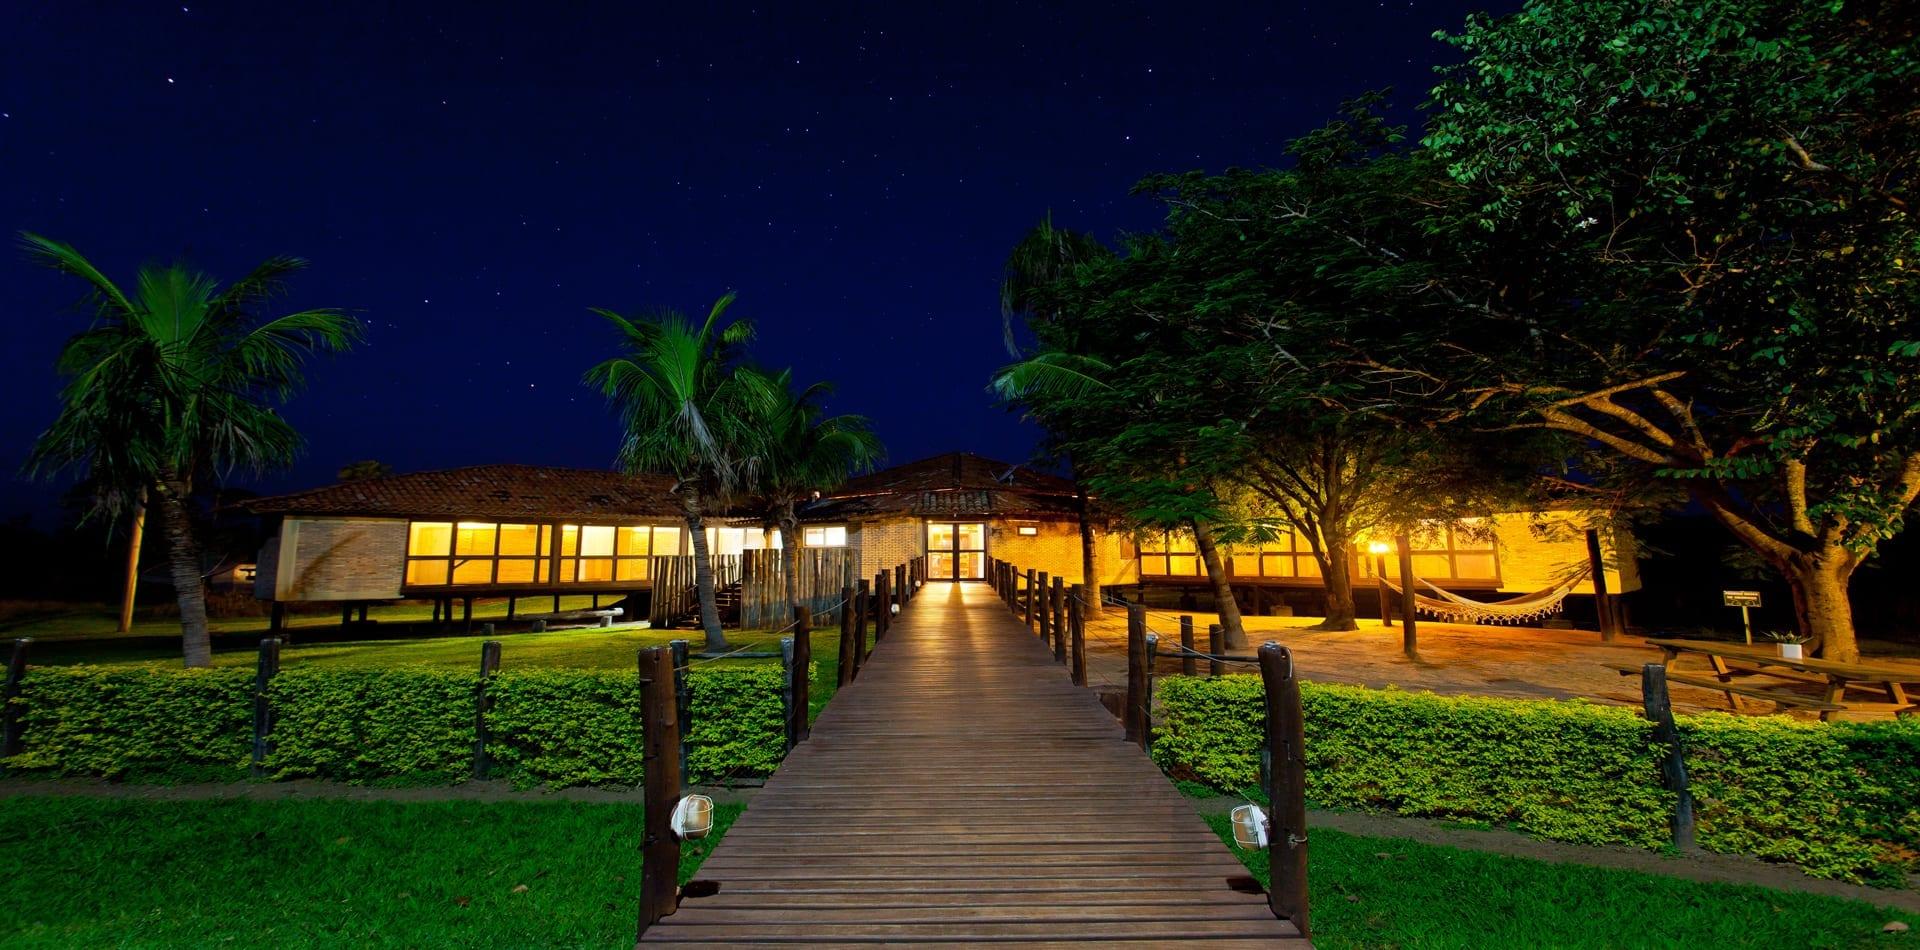 HERO Caiman Eco lodge Brazil